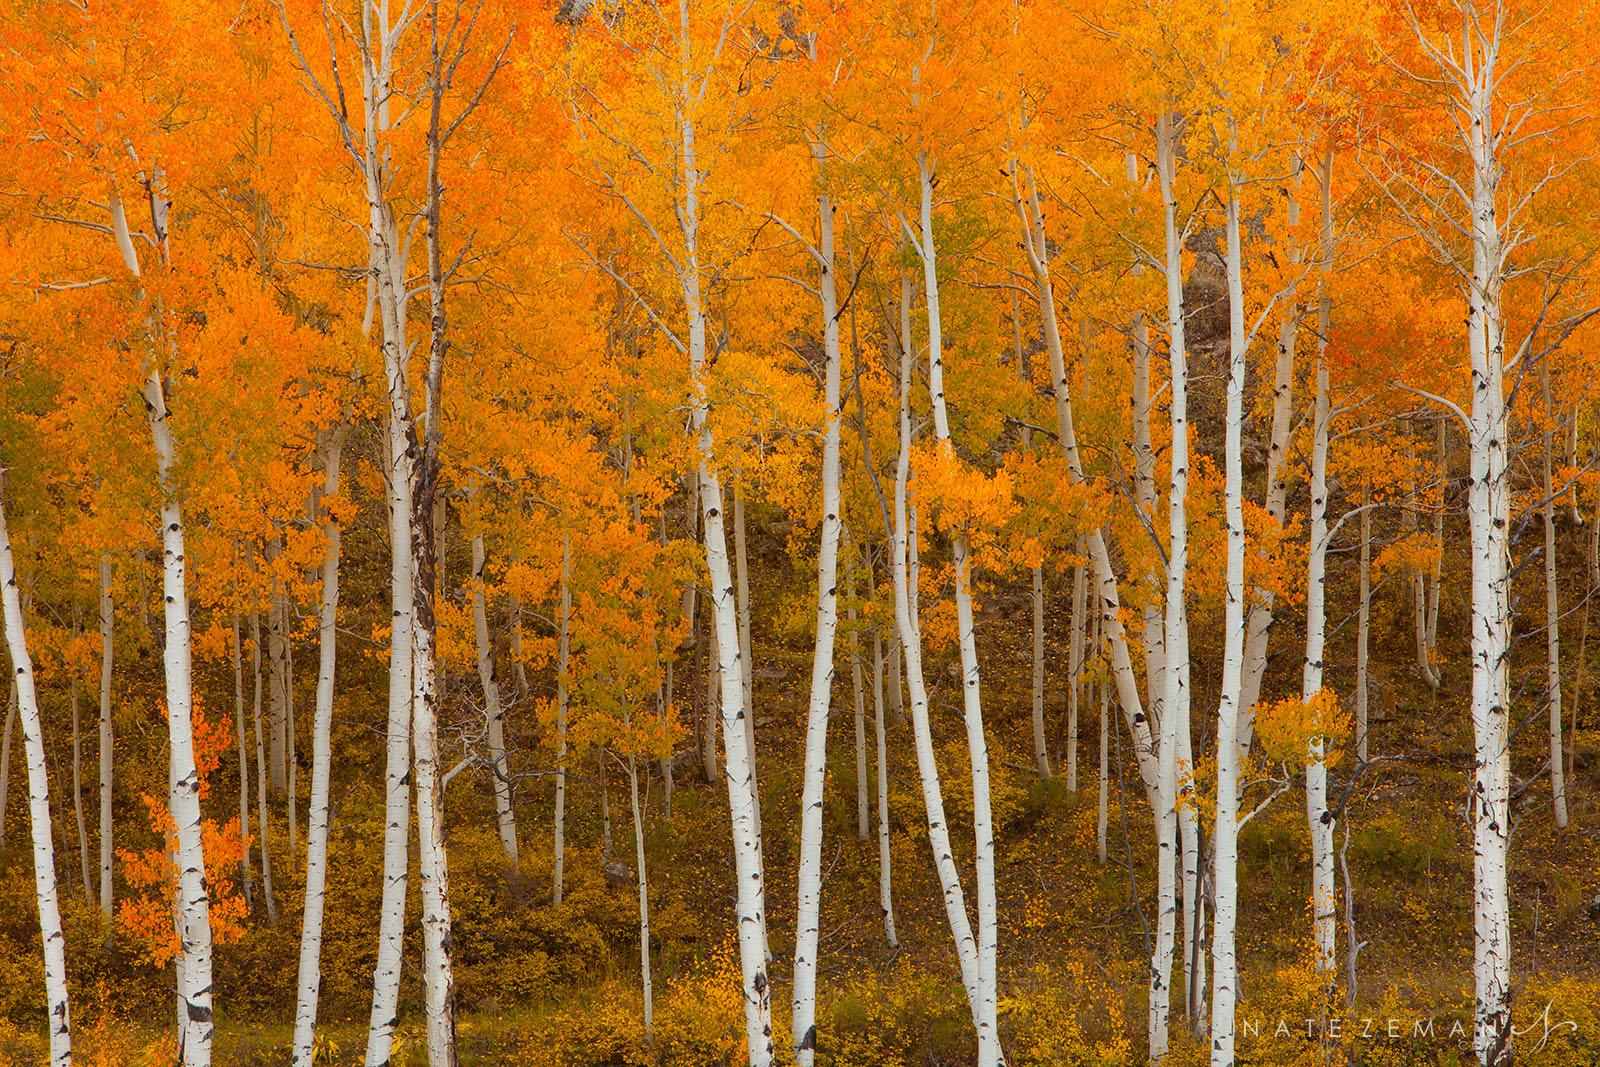 aspen trees, trunks, colorado, uncompahgre, co, san juans, autumn, fall, photo